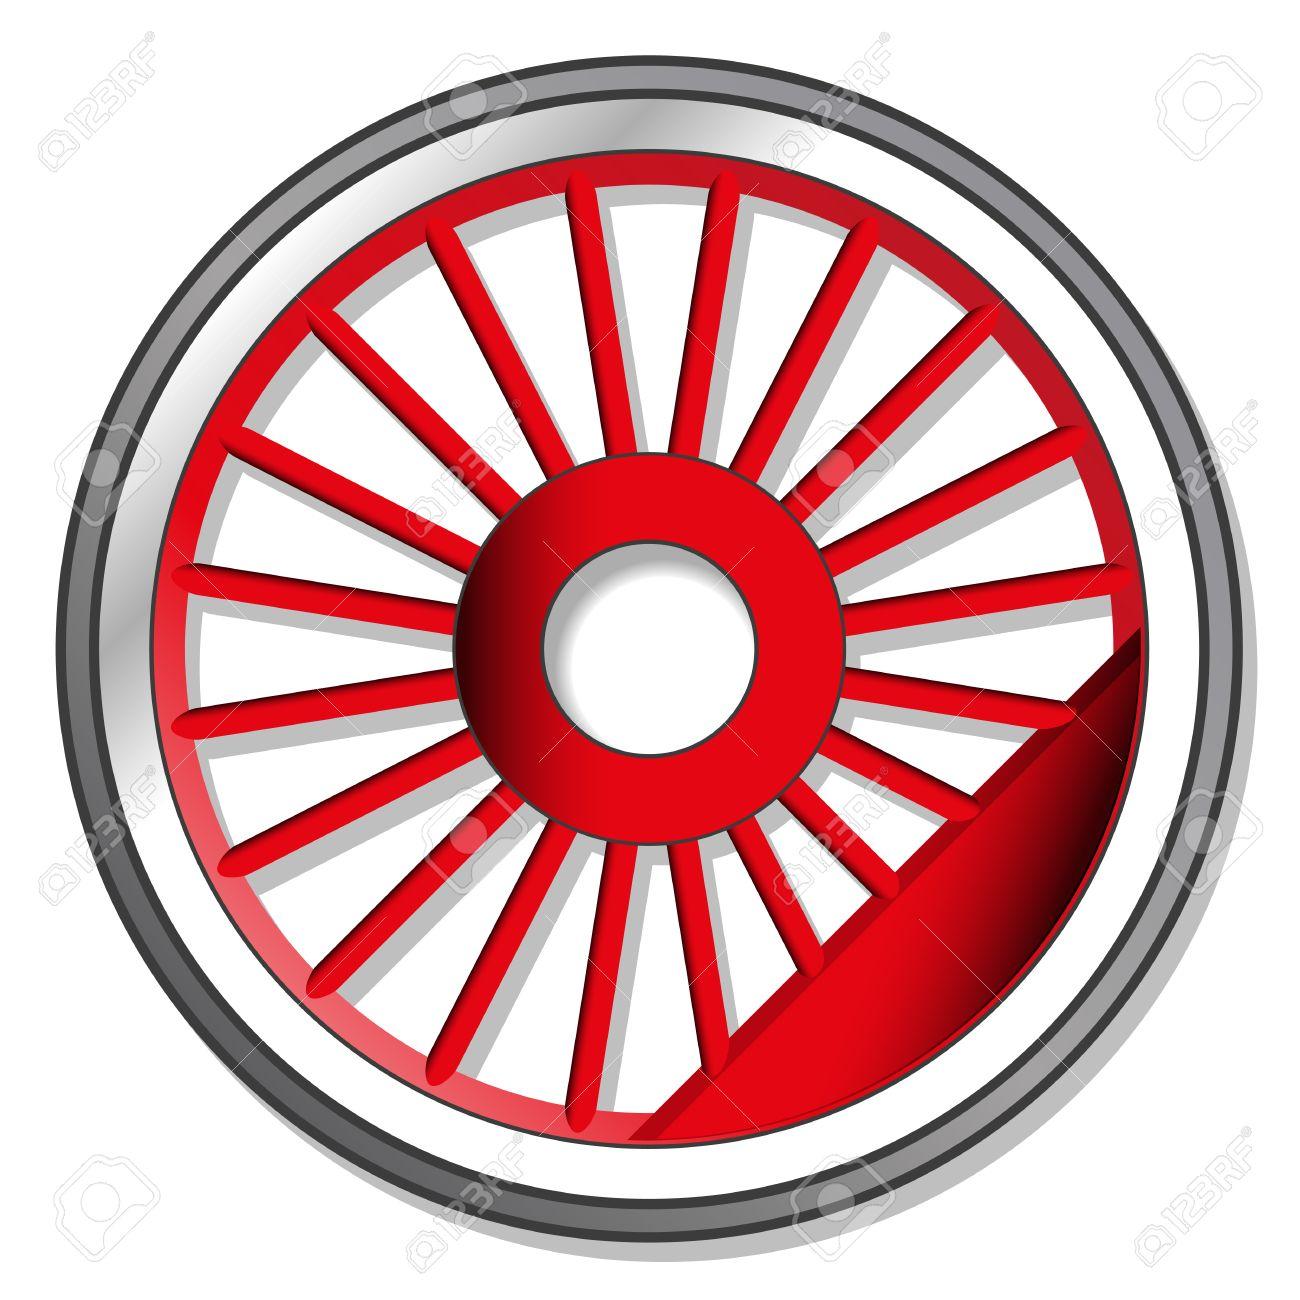 wheel of steam locomotive Stock Vector - 36964473